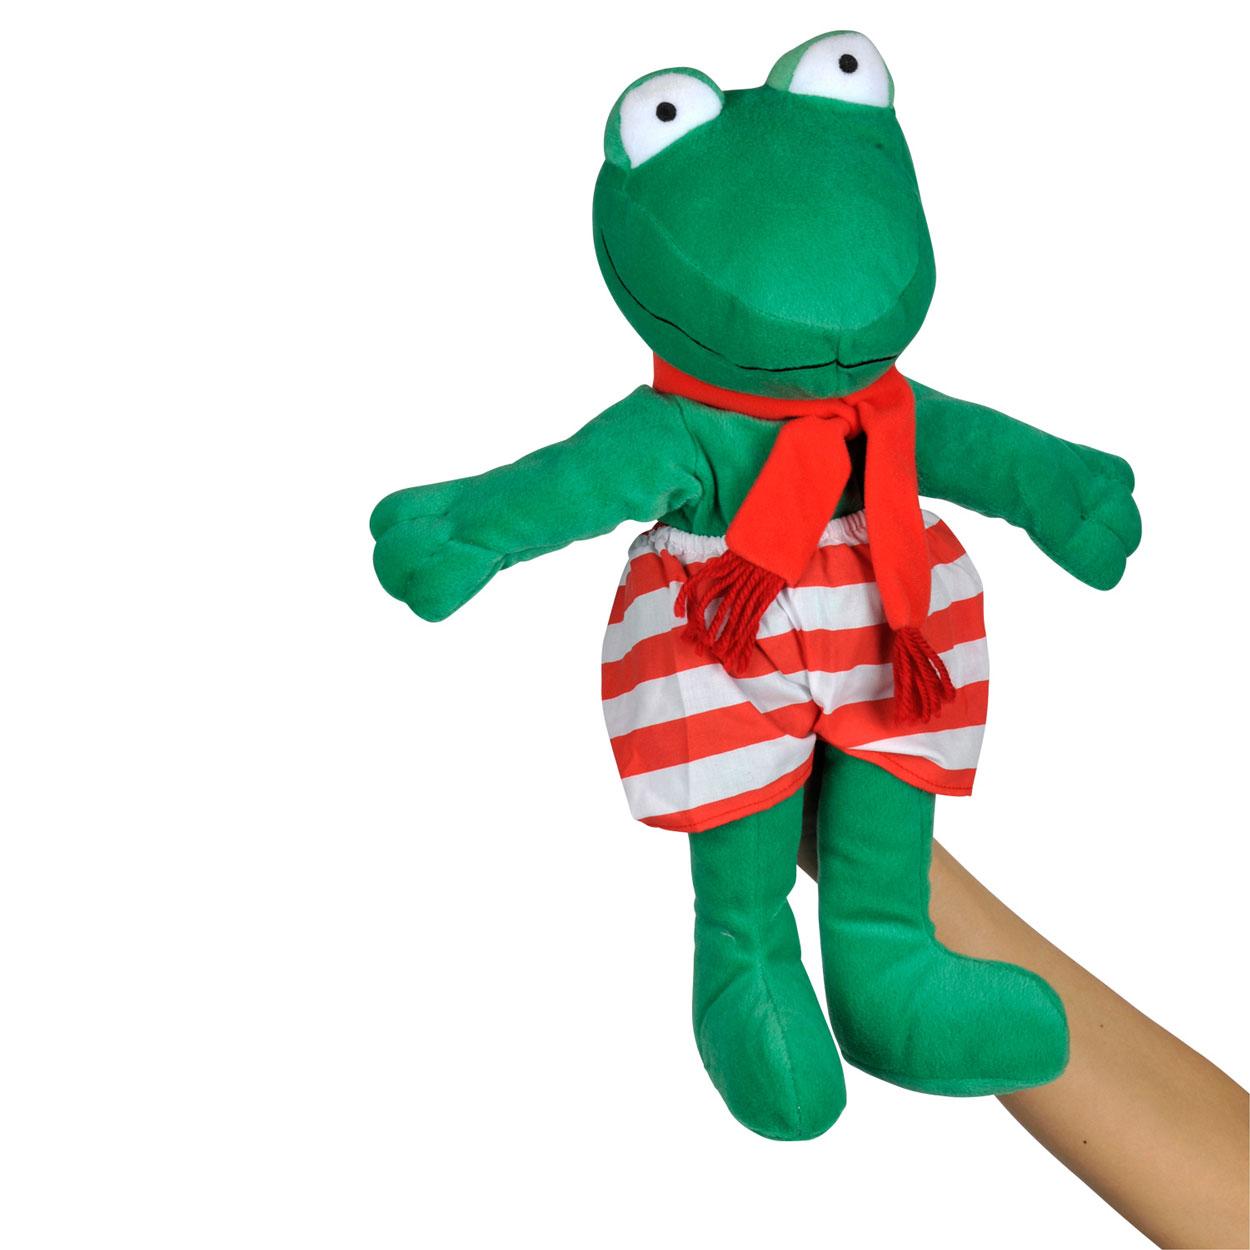 ed7e11a9542d24 Handpop Kikker online kopen | Lobbes Speelgoed